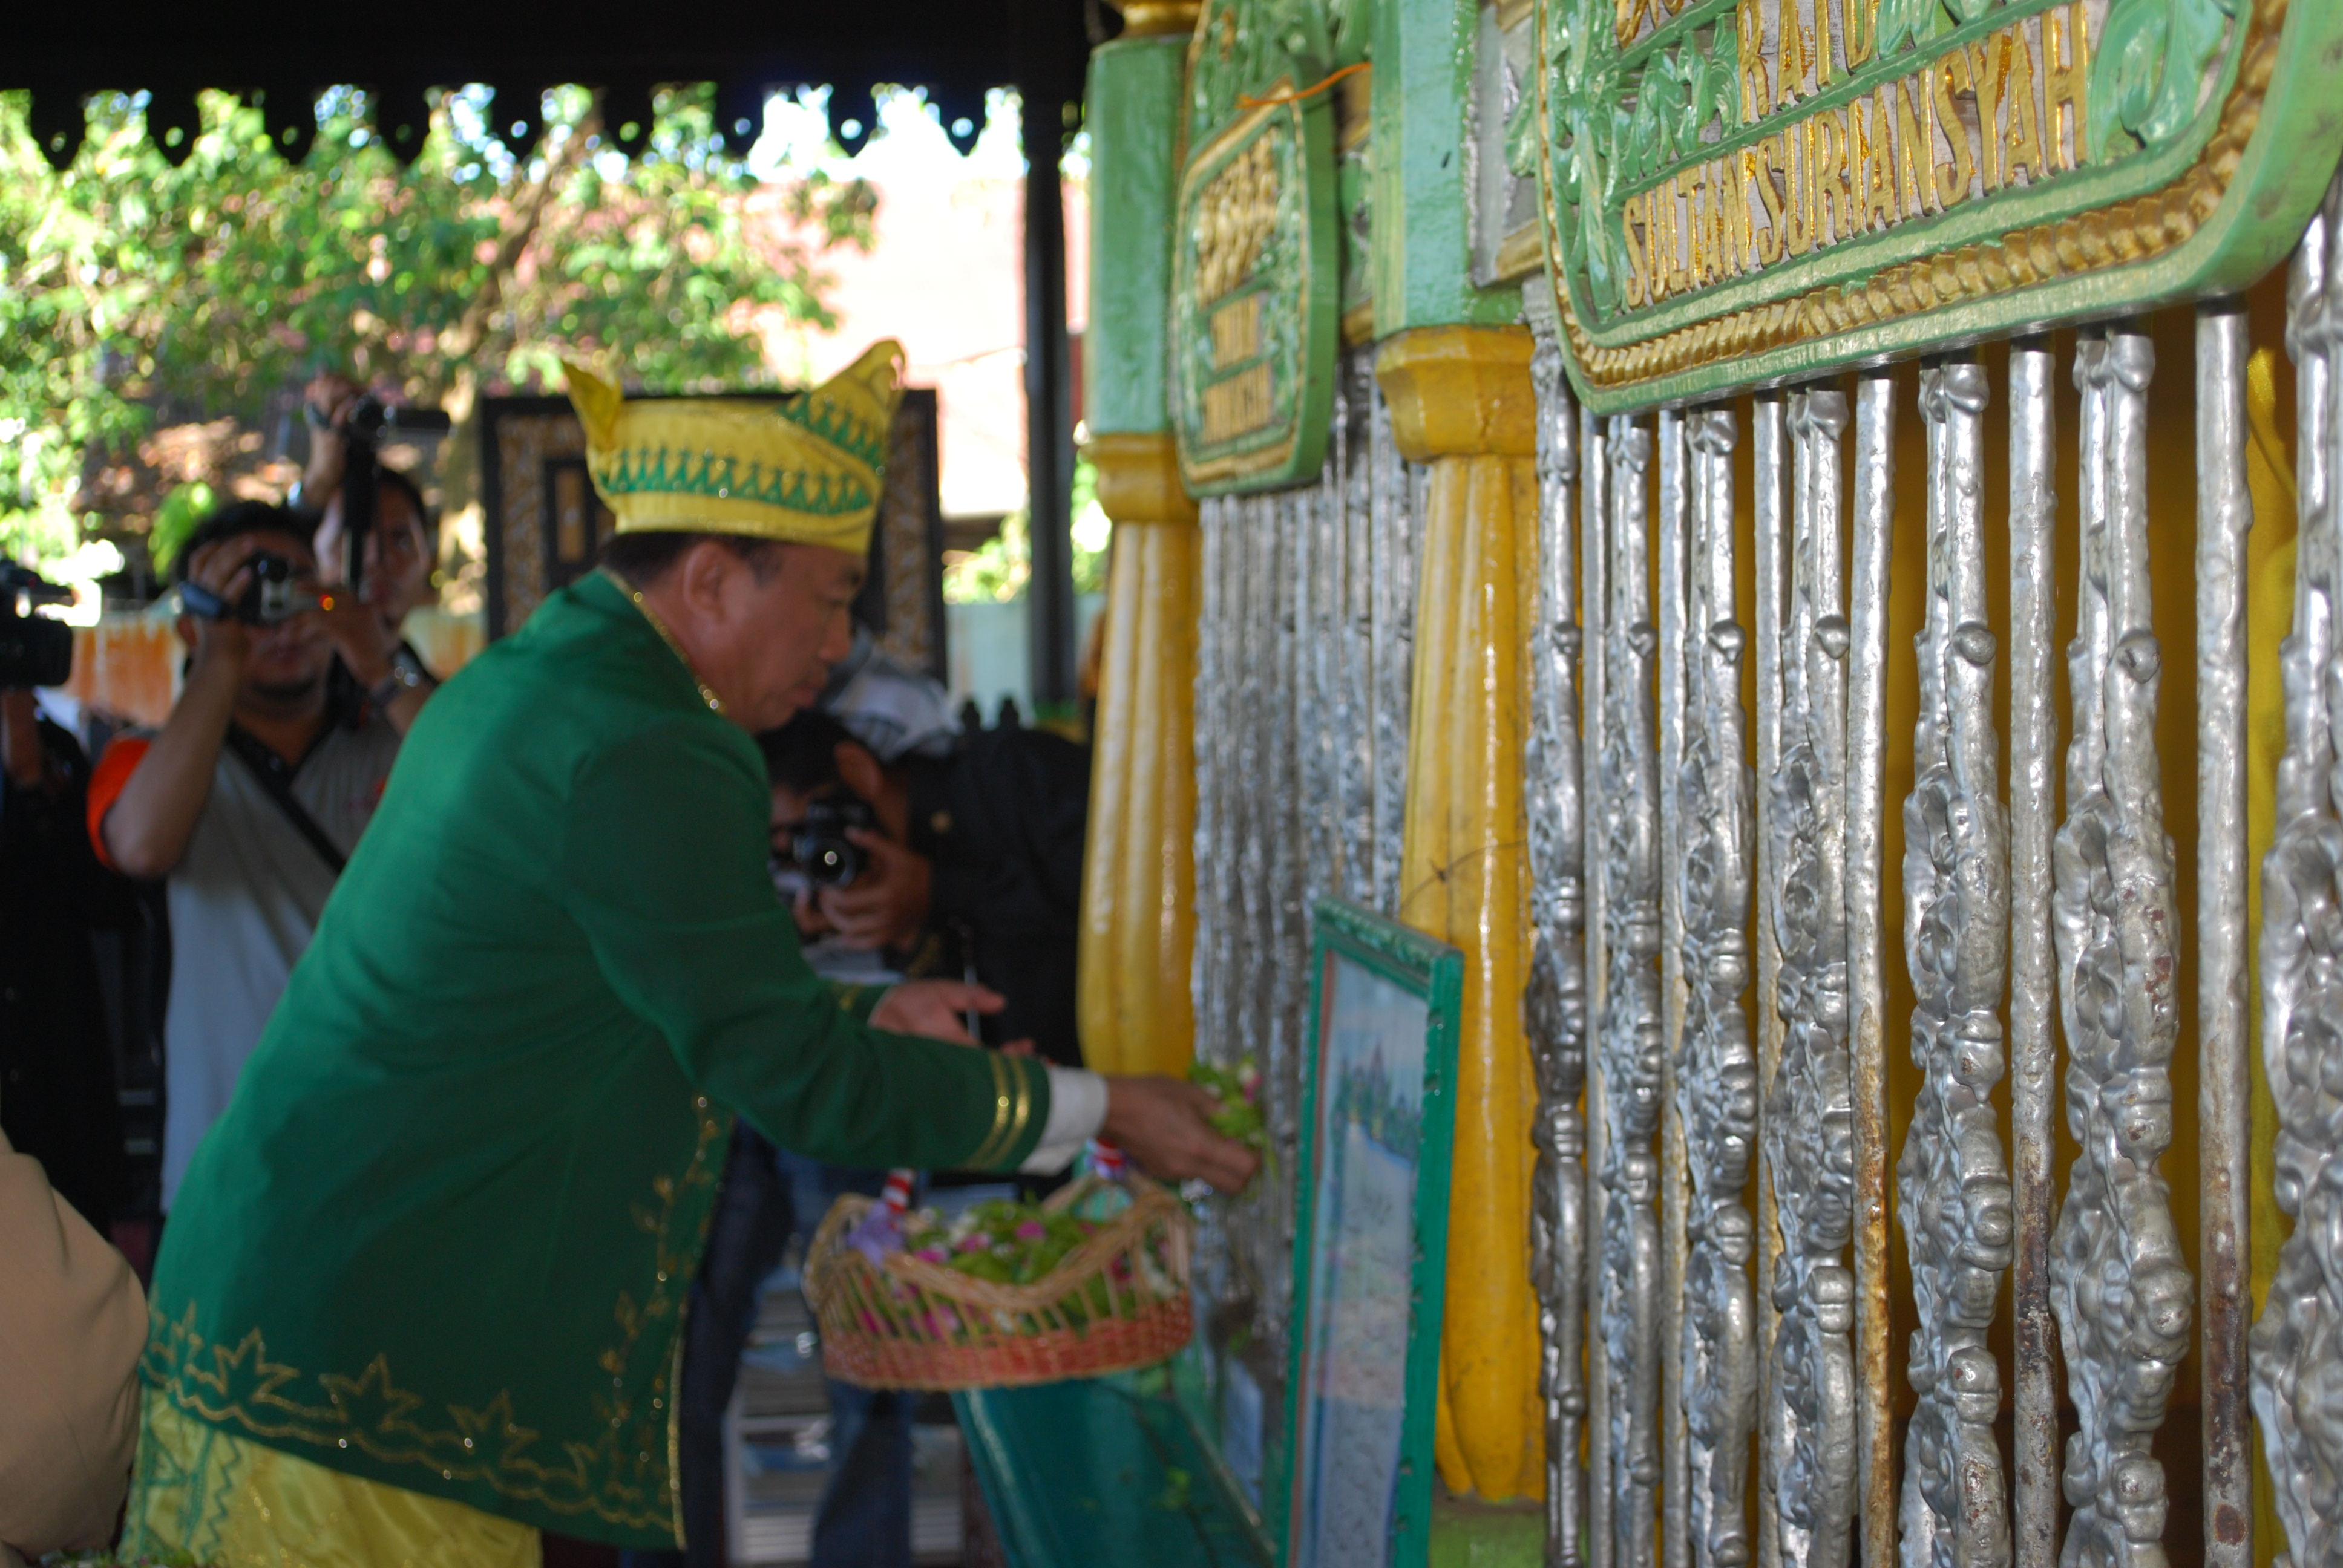 Muhidin Tabur Bunga Sultan Suriansyah Silaturrahmi Jawa Kalimantan Walikota Banjarmasin